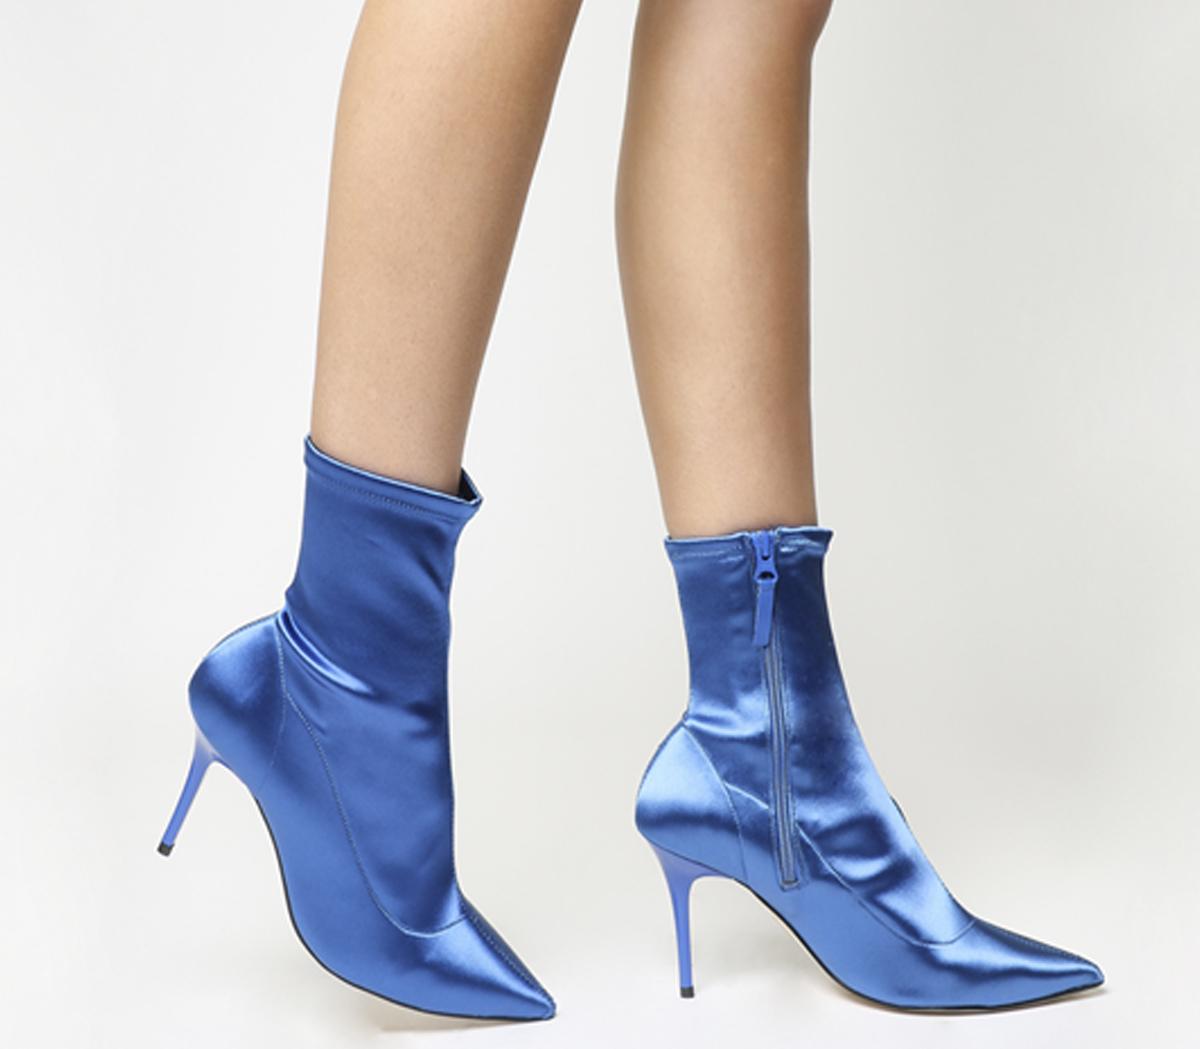 vasta selezione di 8495f 79fef Dettagli su Donna Office Afrodite Dressy Stivali Stretch Raso Blu Stivali  Stretch